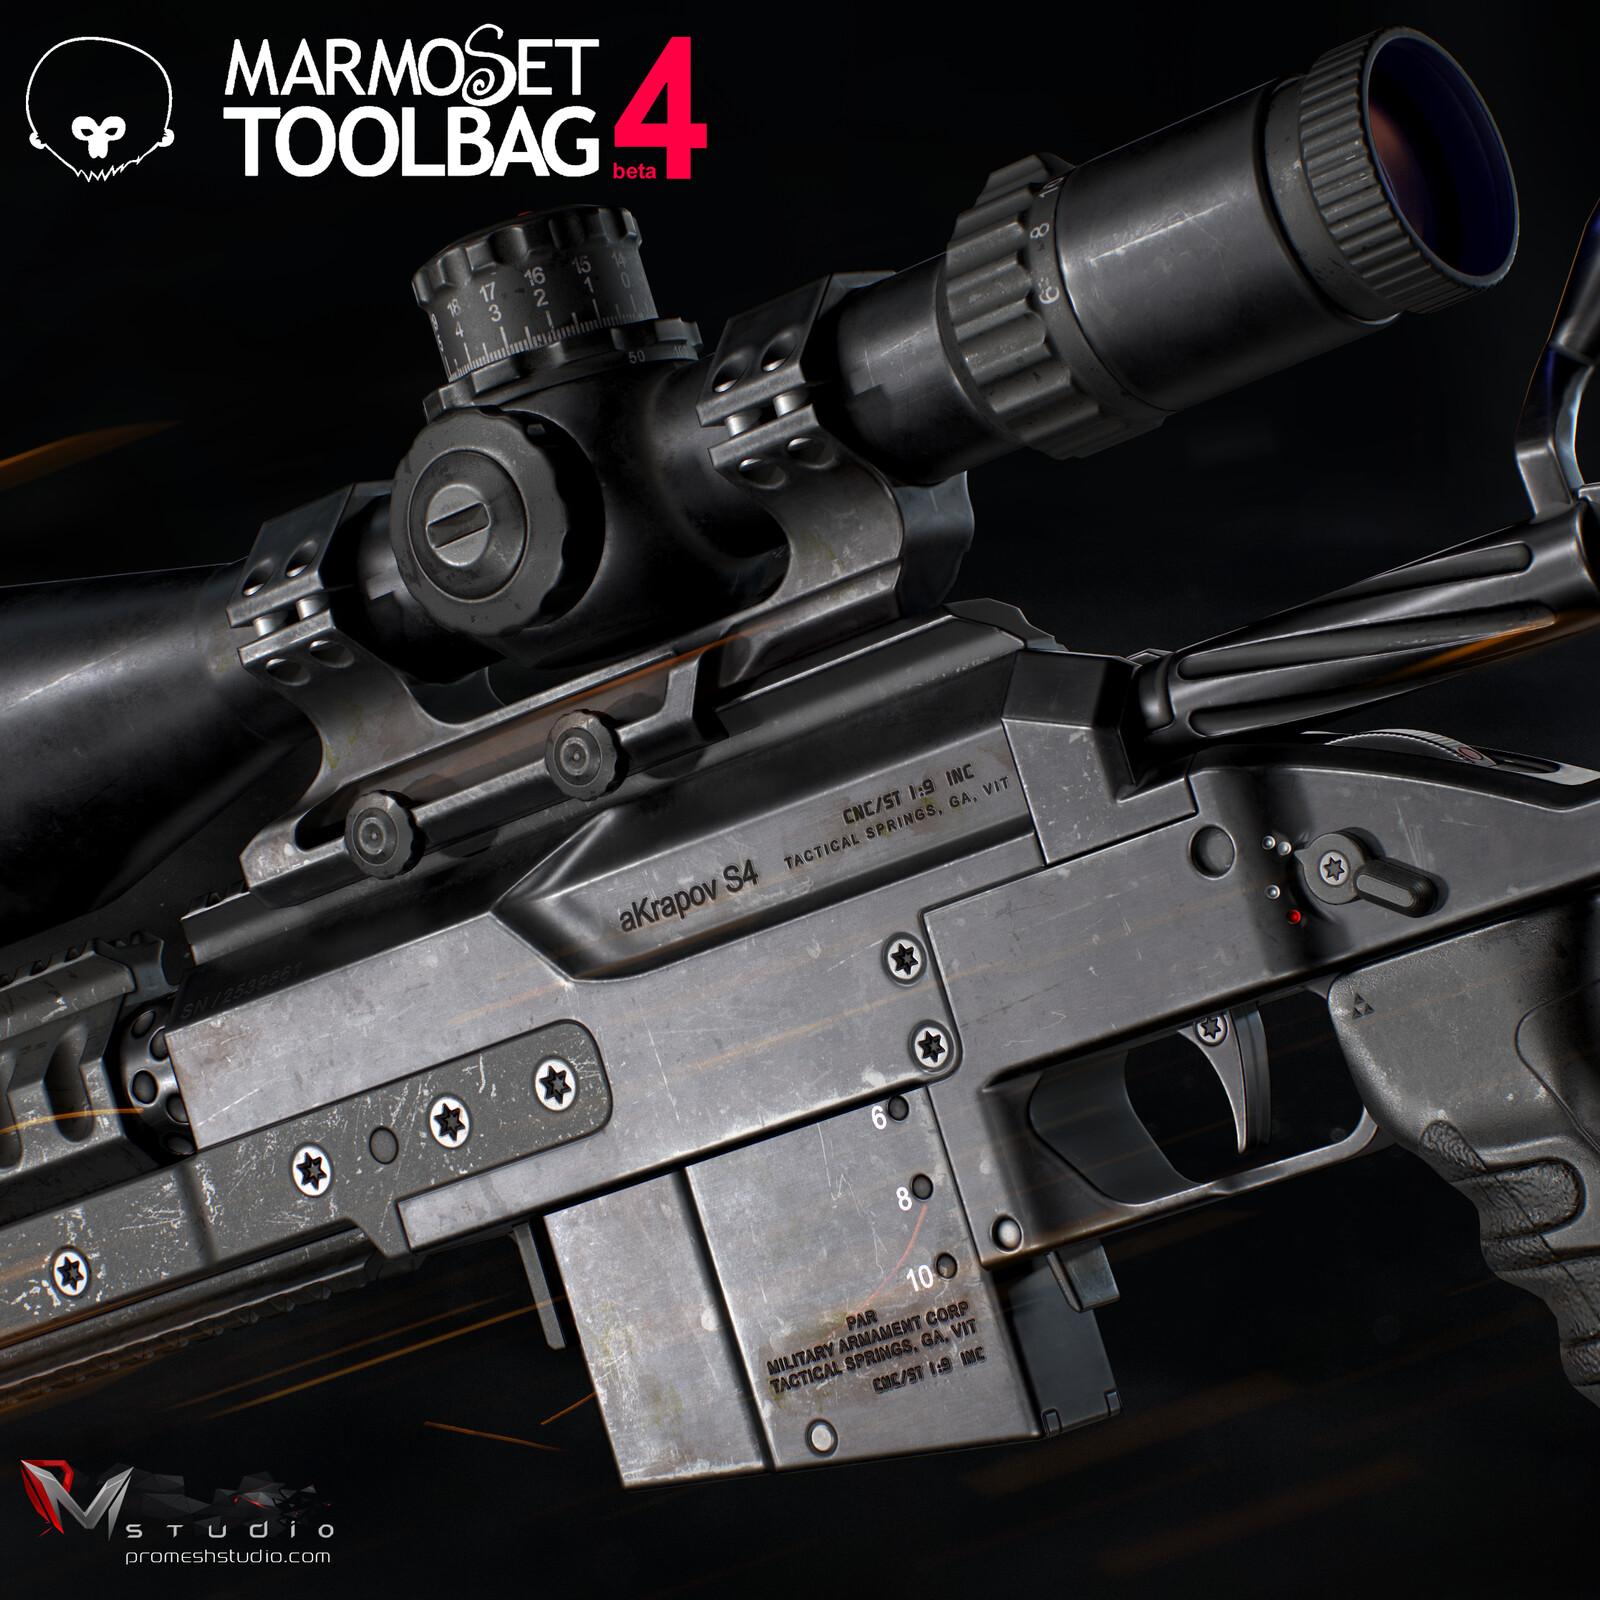 PMS aKrapov S4 Sniper Rifle